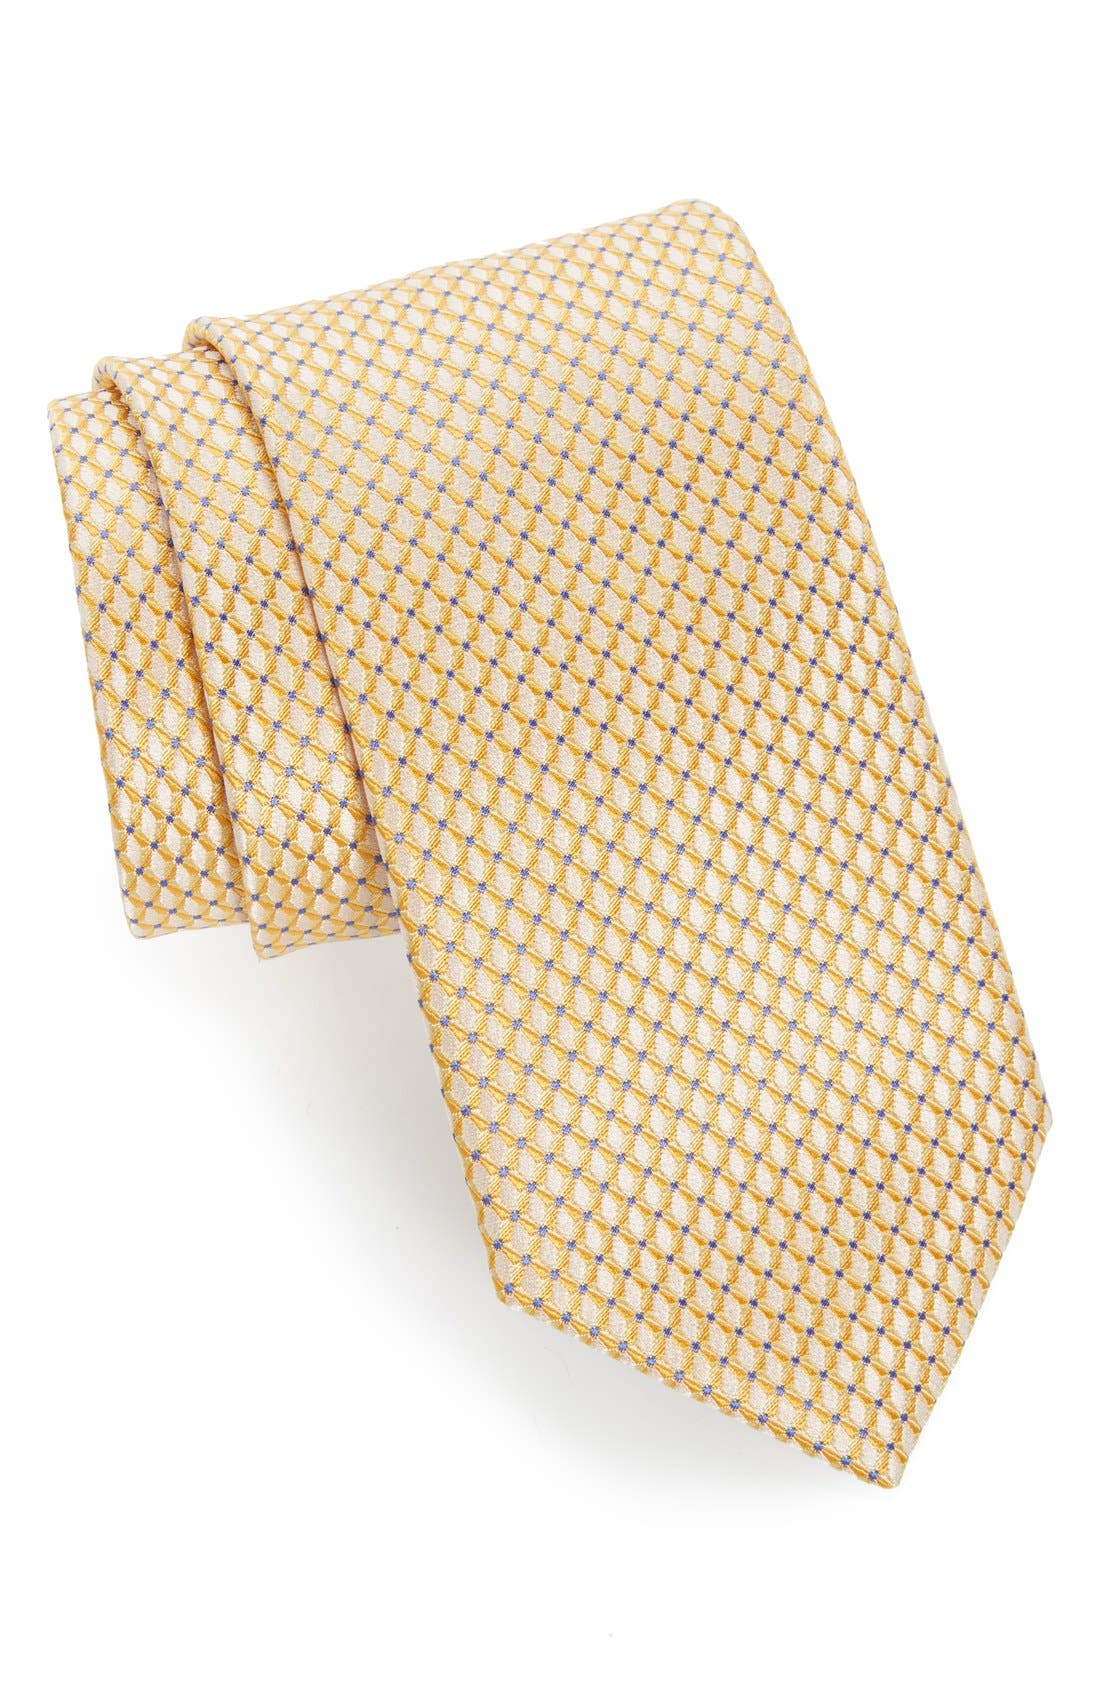 Alternate Image 1 Selected - John W. Nordstrom® 'Grayson Mini' Silk Tie